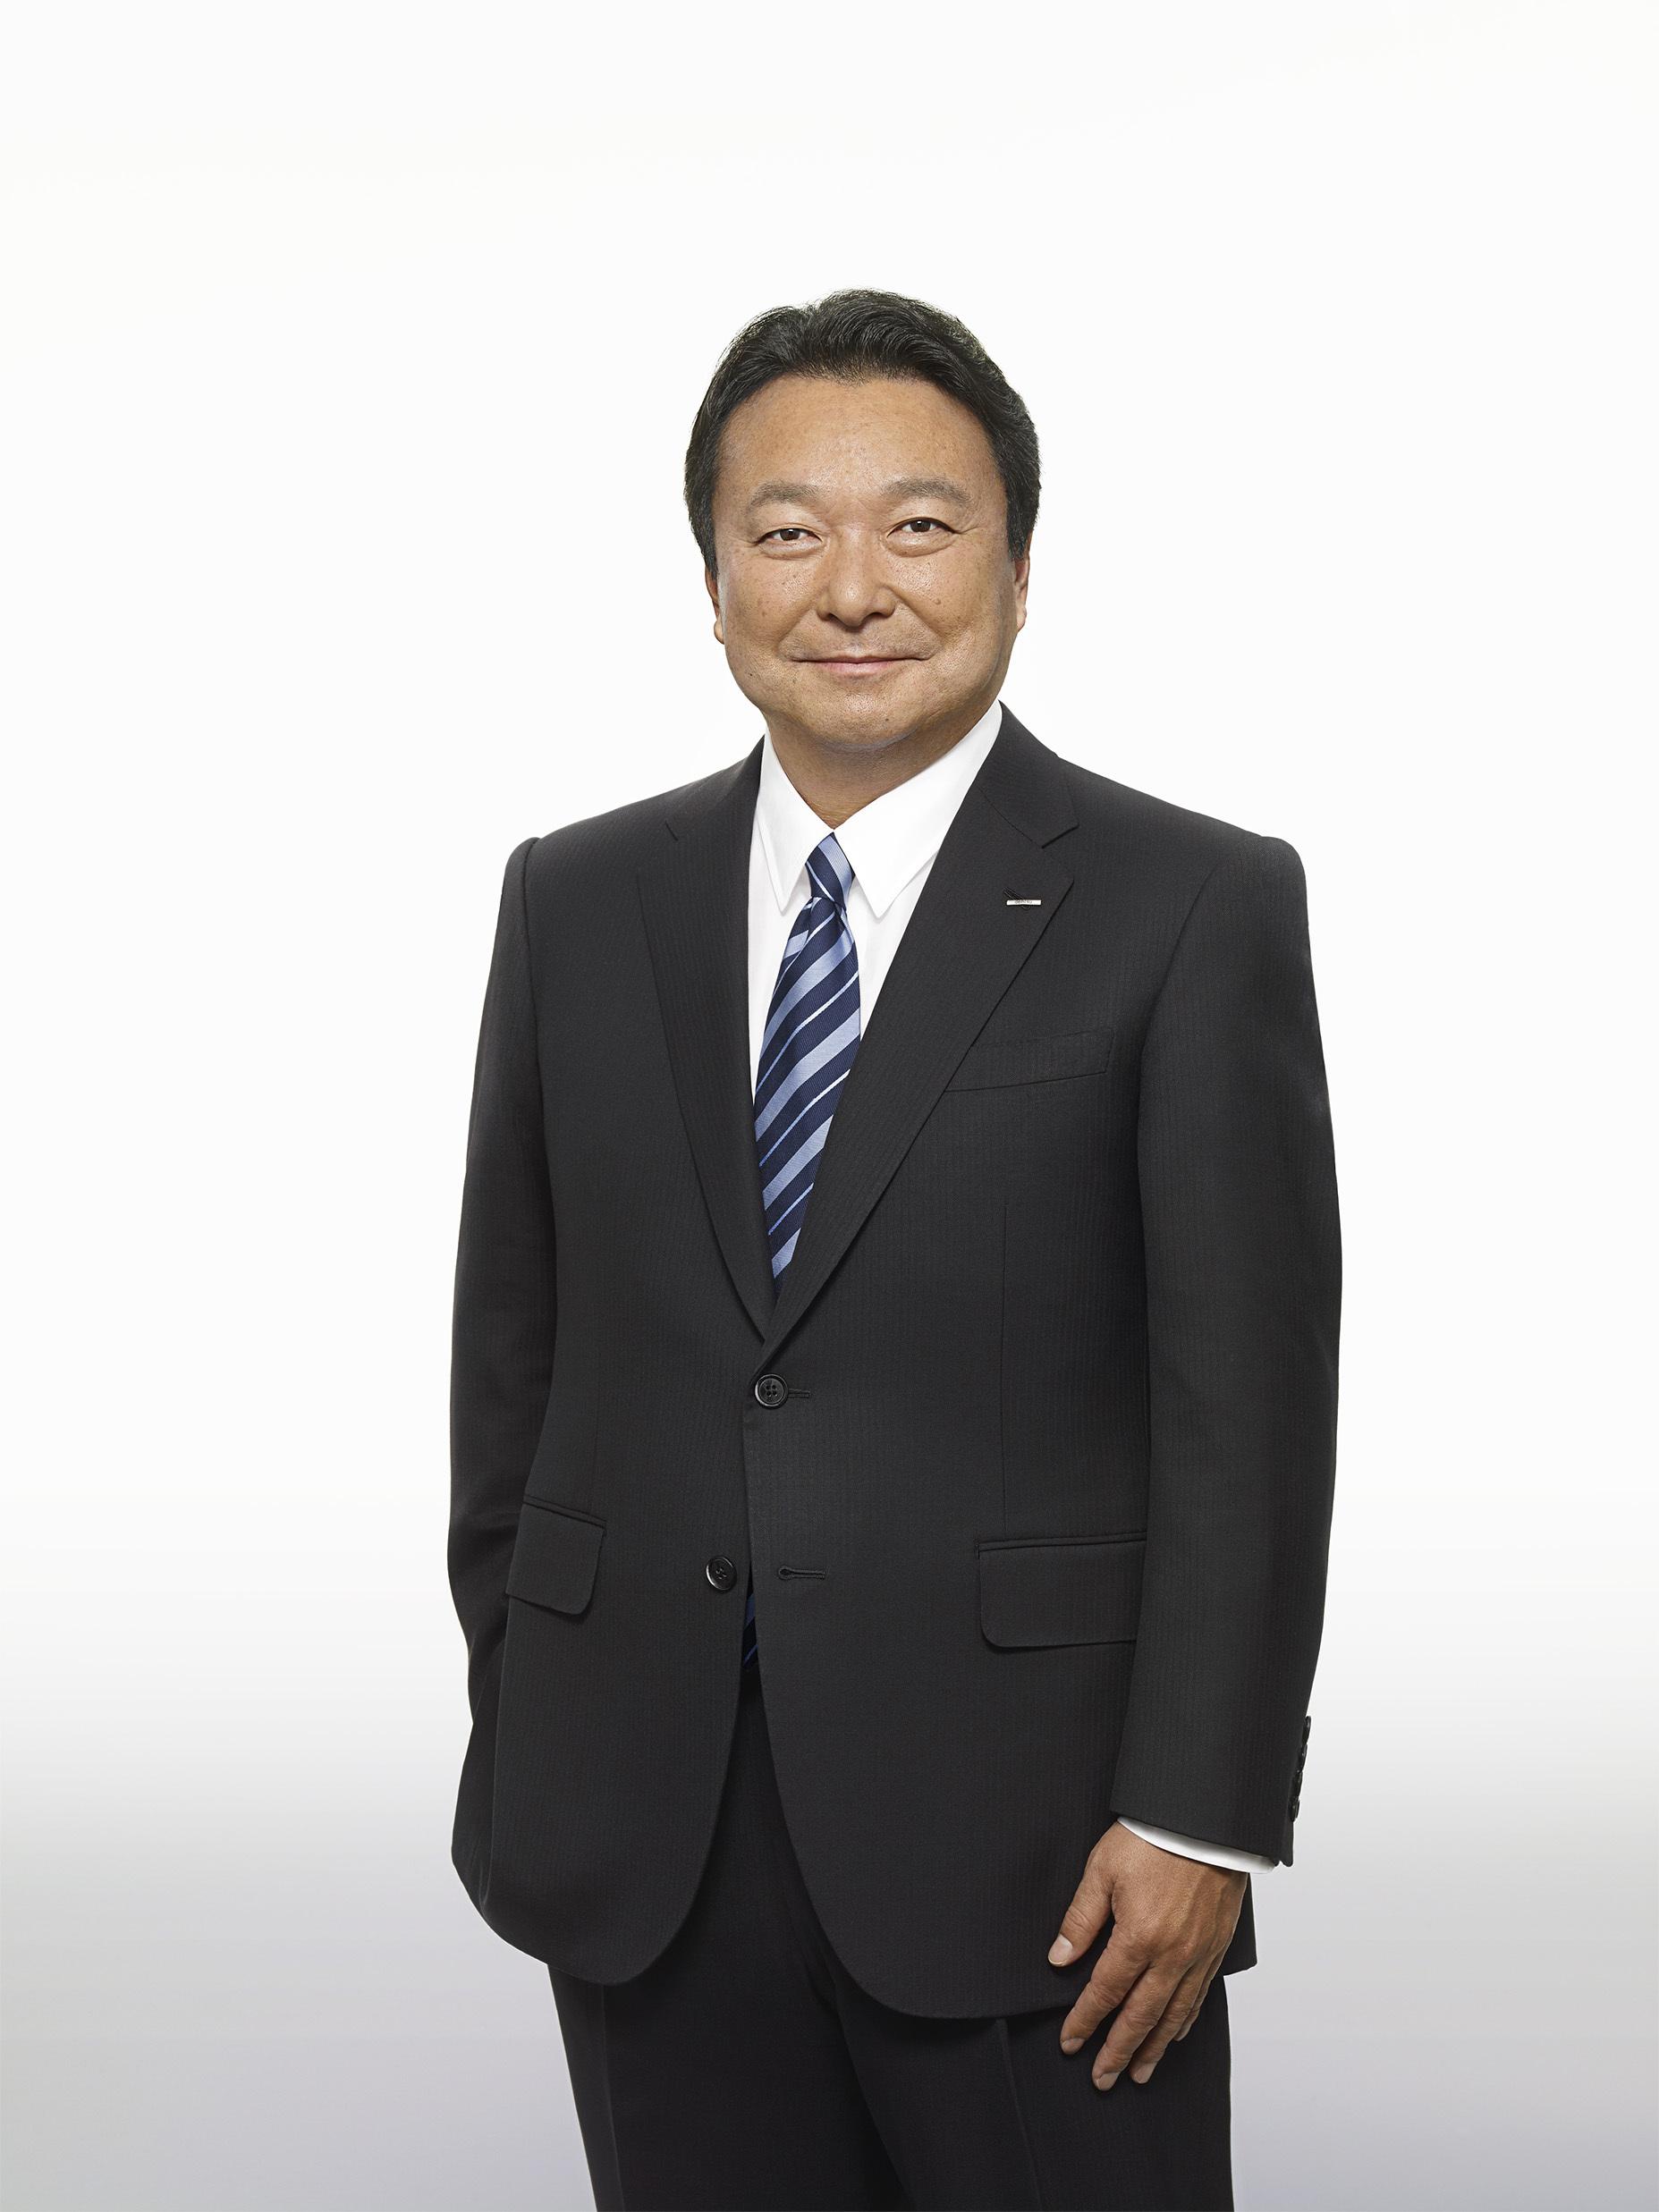 Toshihiro Yamamoto, President & CEO, Dentsu Inc. (Photo: Business Wire)